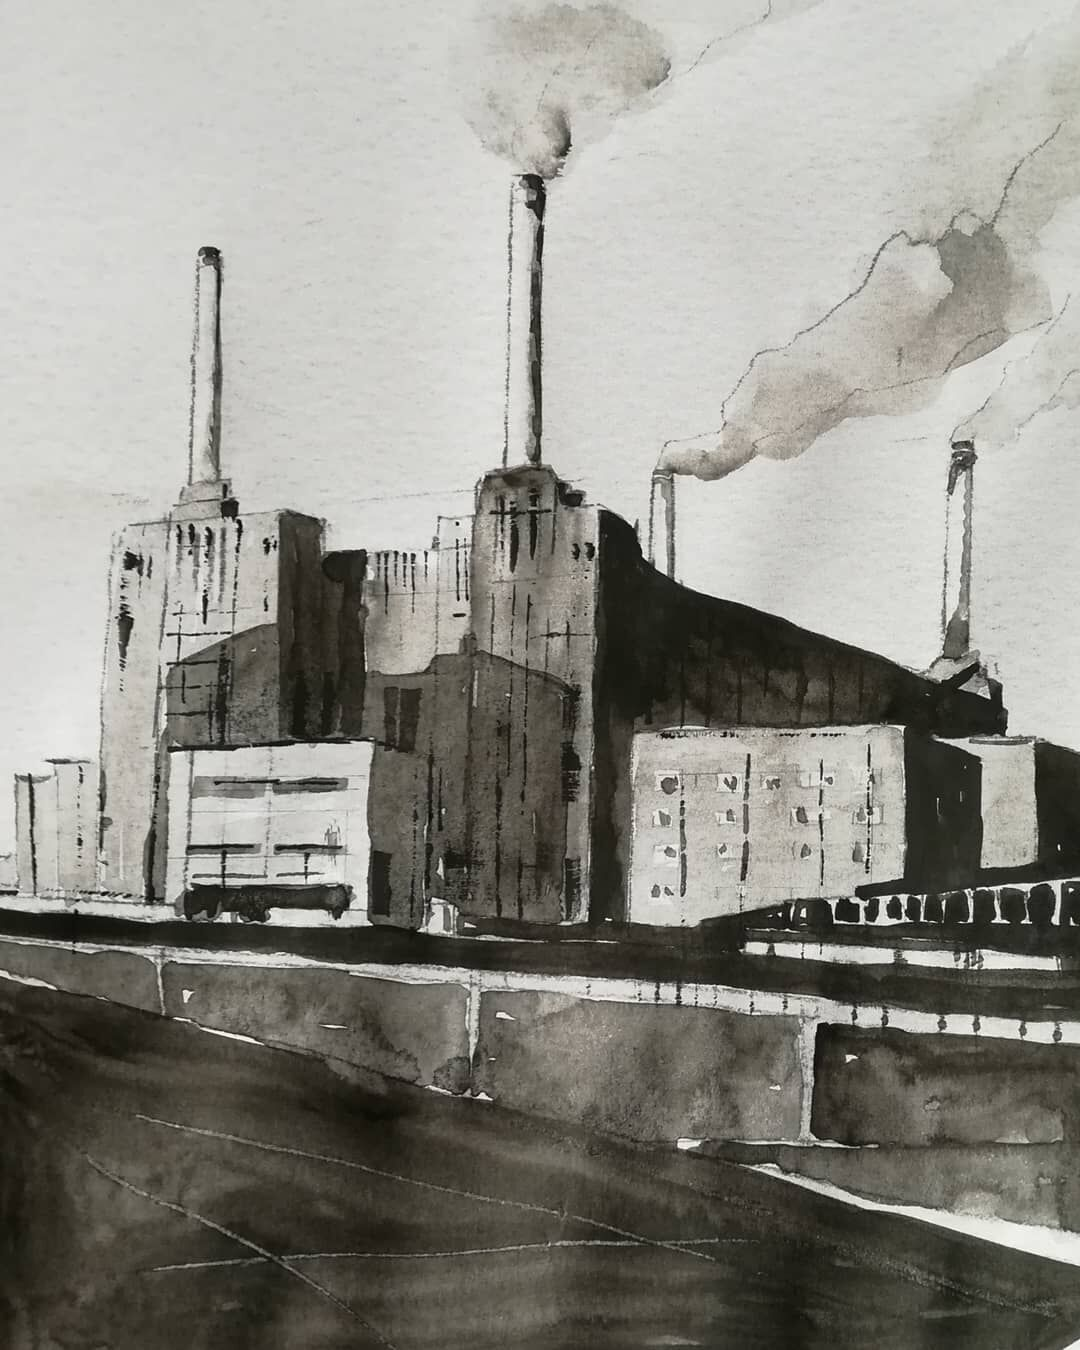 Battersea Power Station 2 ~ original watercolour. More details to follow